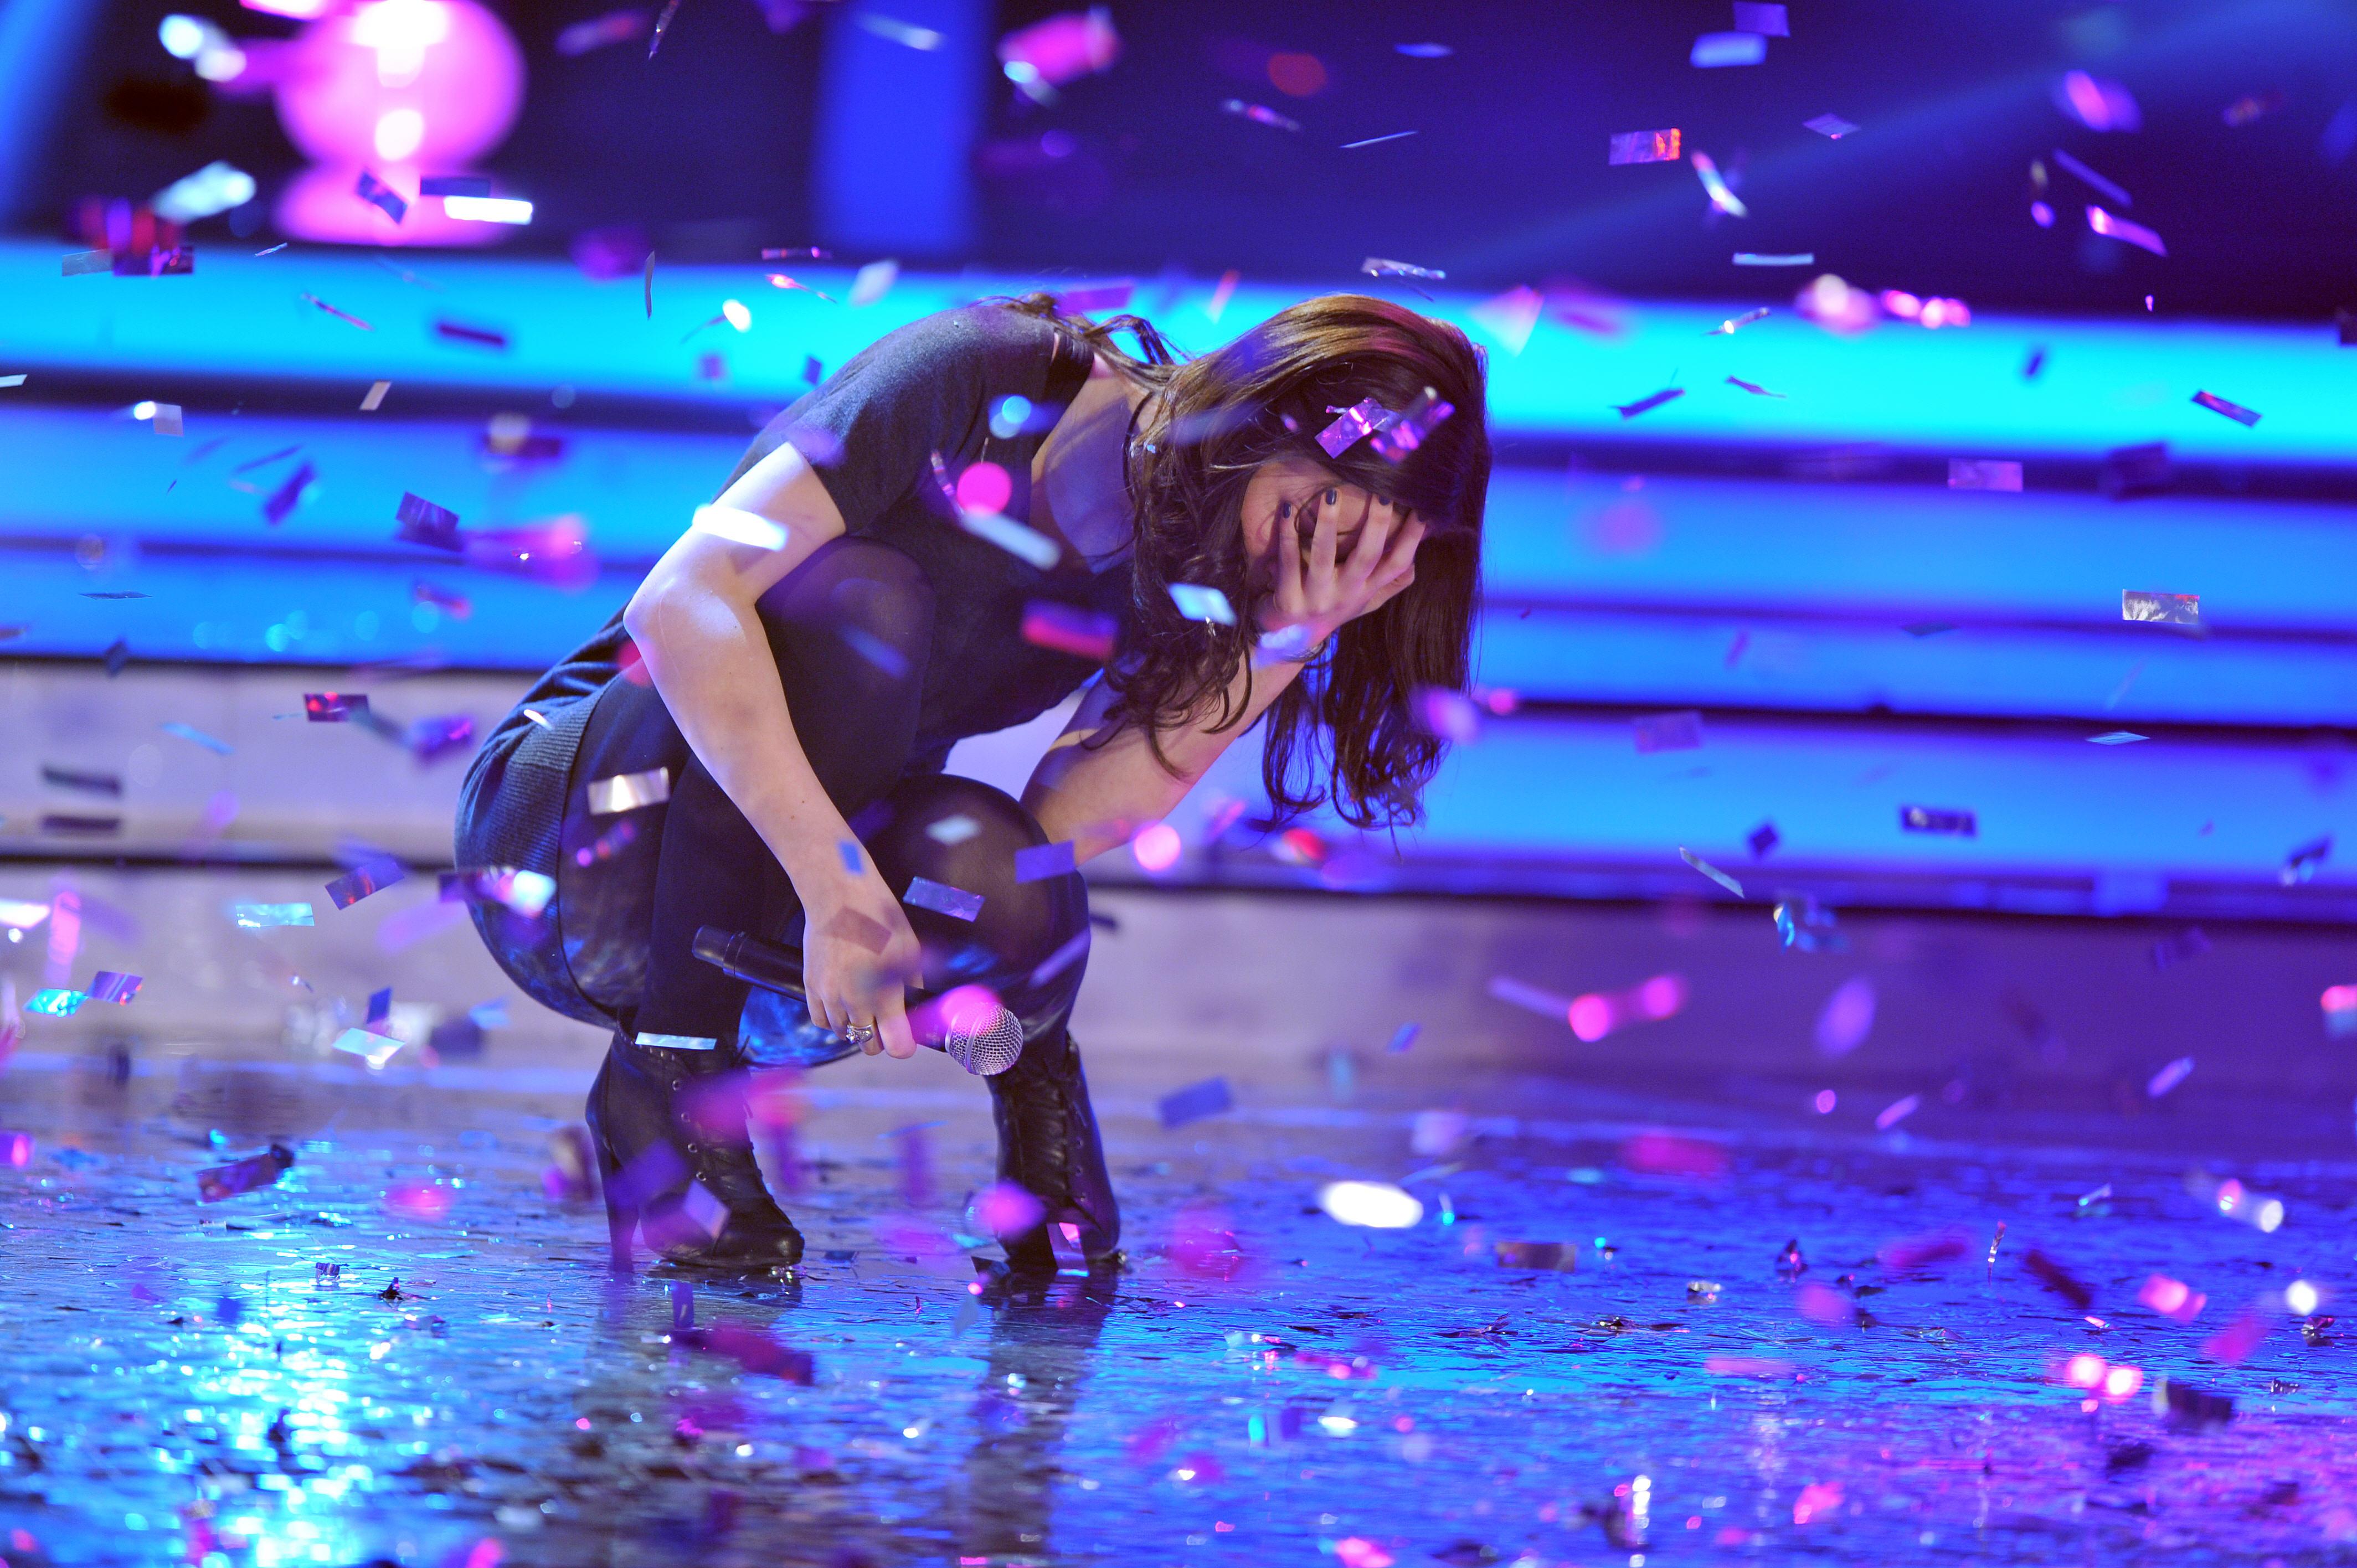 Lena Meyer Landrut Eurovision Song Contest Wallpaper 4256x2832 59398 Wallpaperup